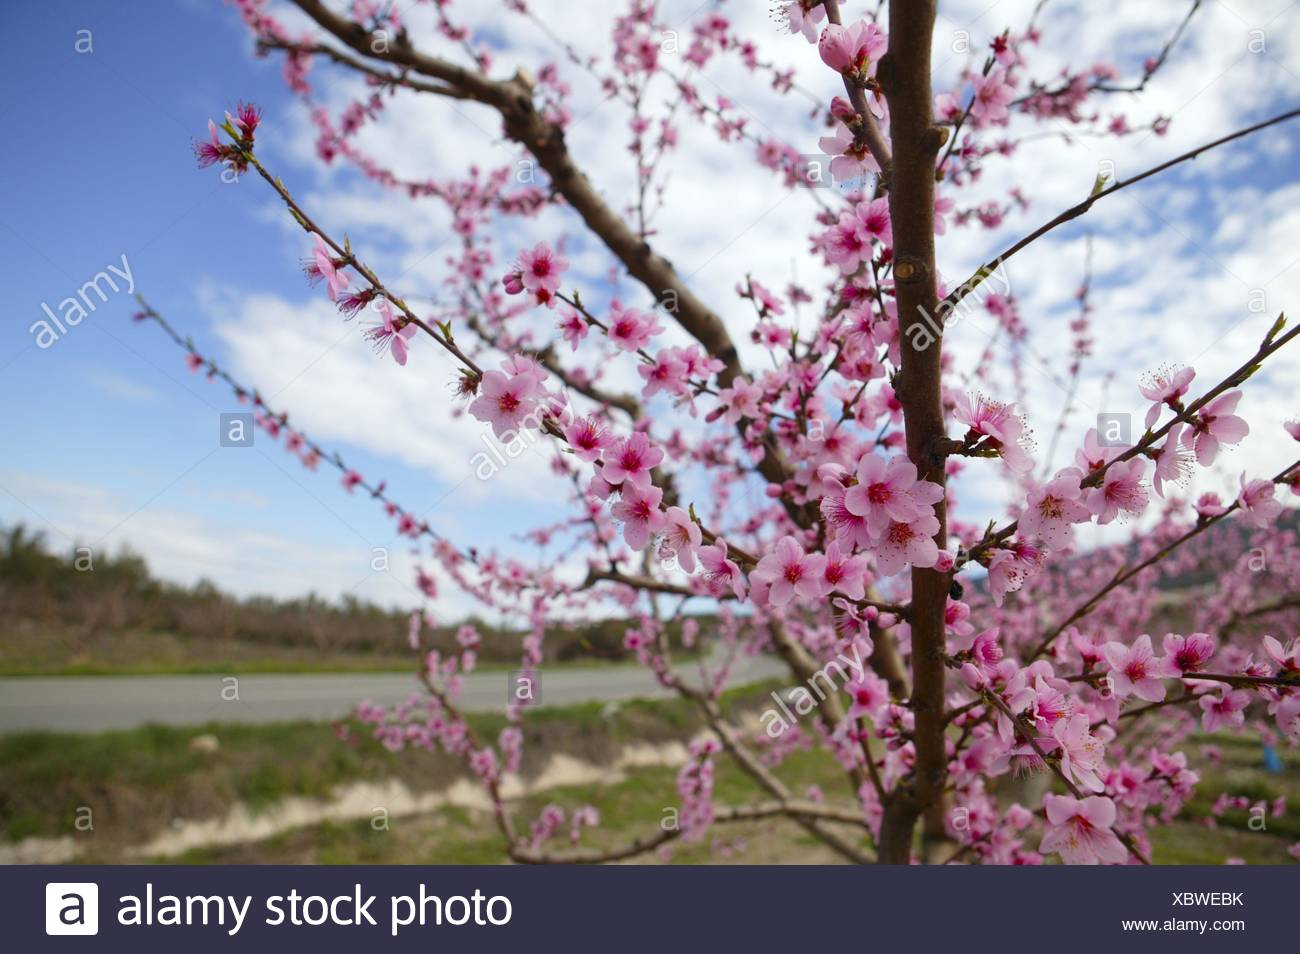 Almond Flower Trees Field In Spring Season Pink White Flowers Stock